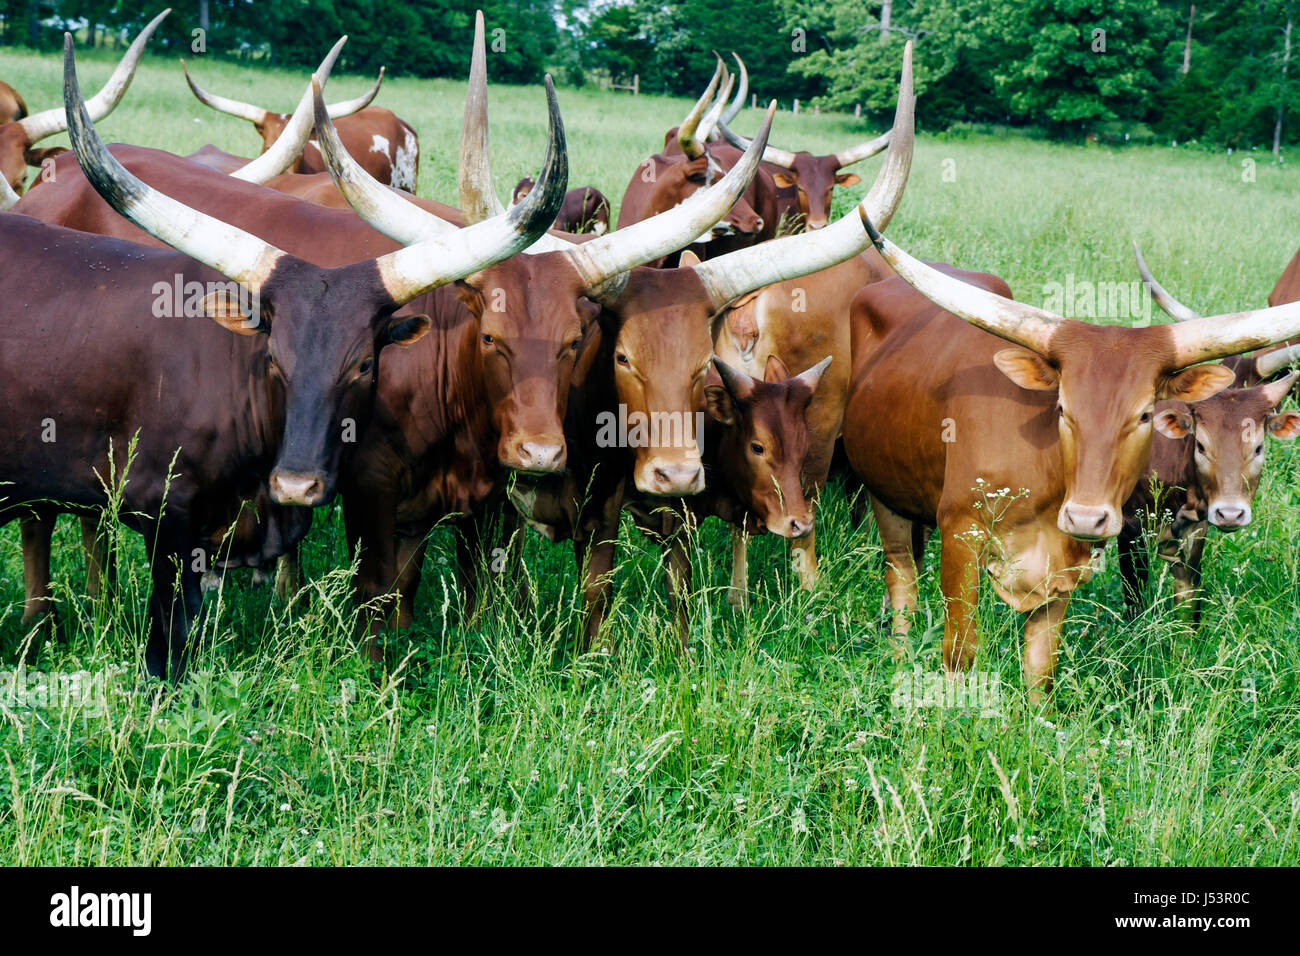 L'Arkansas Maynard bovins Watusi Ankole race africaine mammifère animal importé de grandes cornes Photo Stock